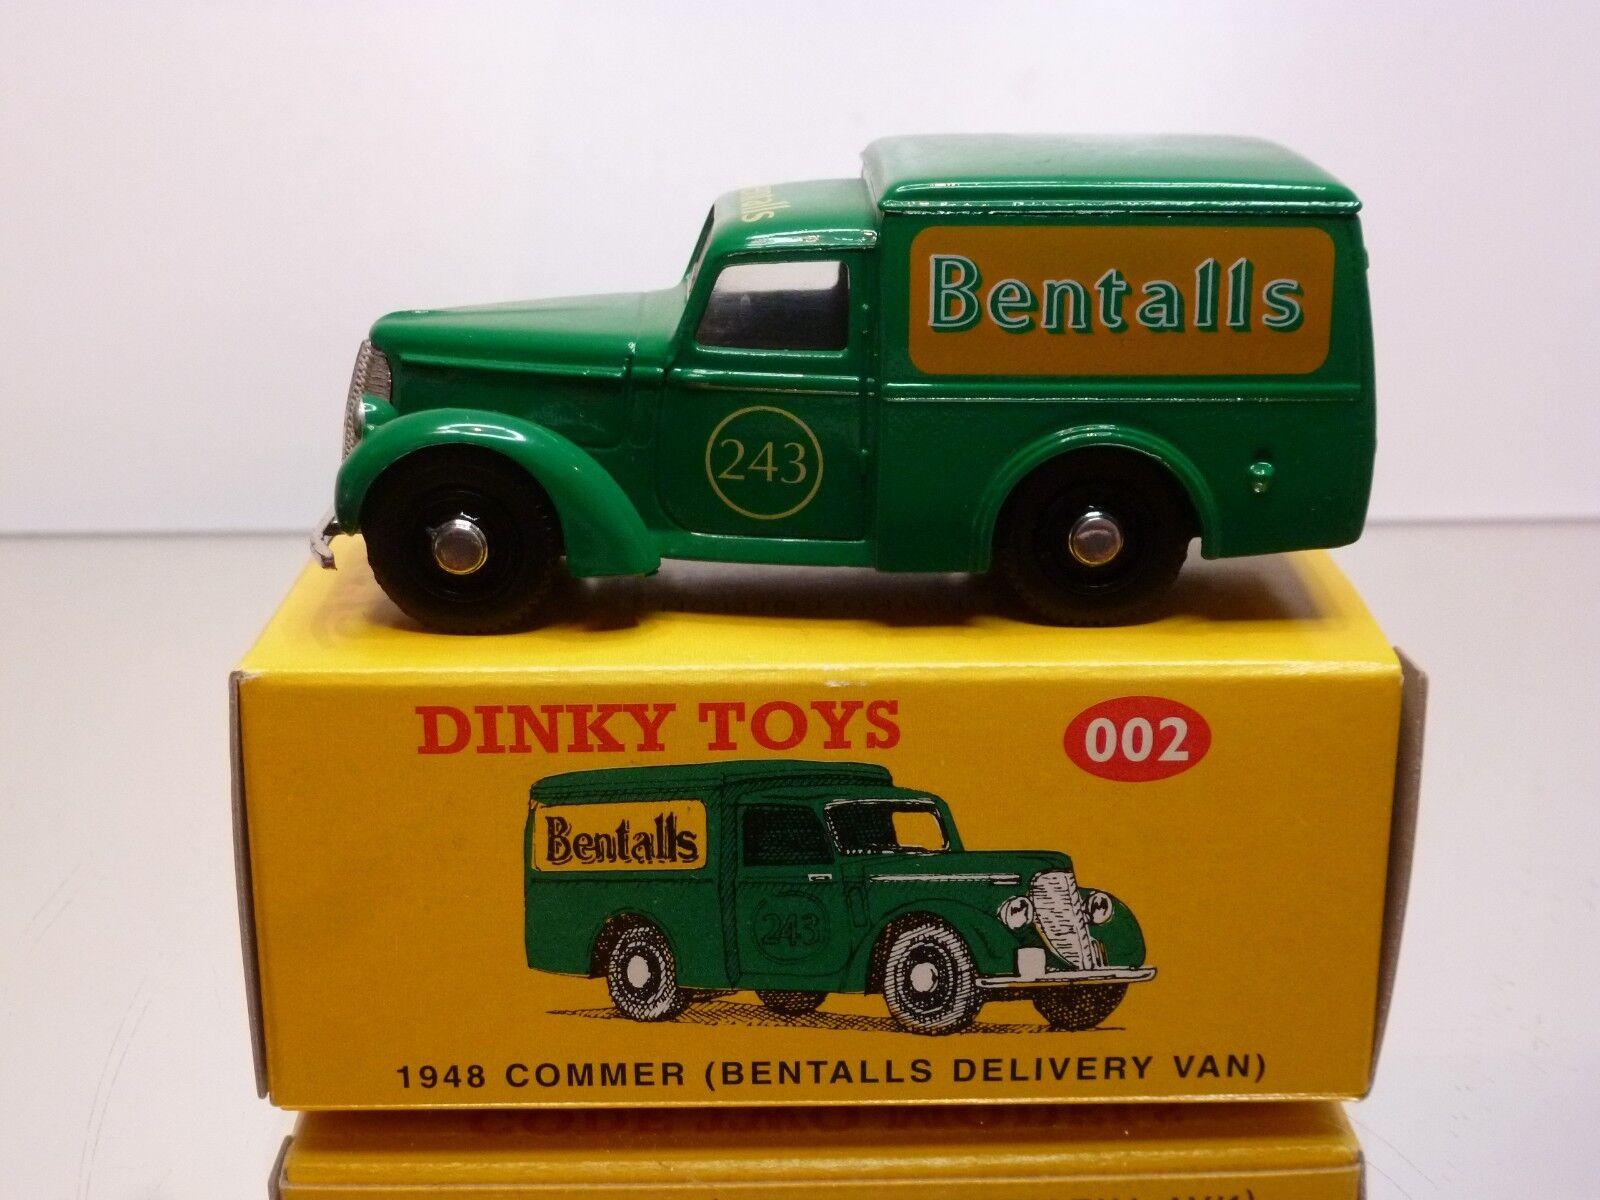 DINKY TOYS CODE 2 002 COMMER 1948 BENTALLS DELIVERY VAN - 1 43 - EXCELLENT IB